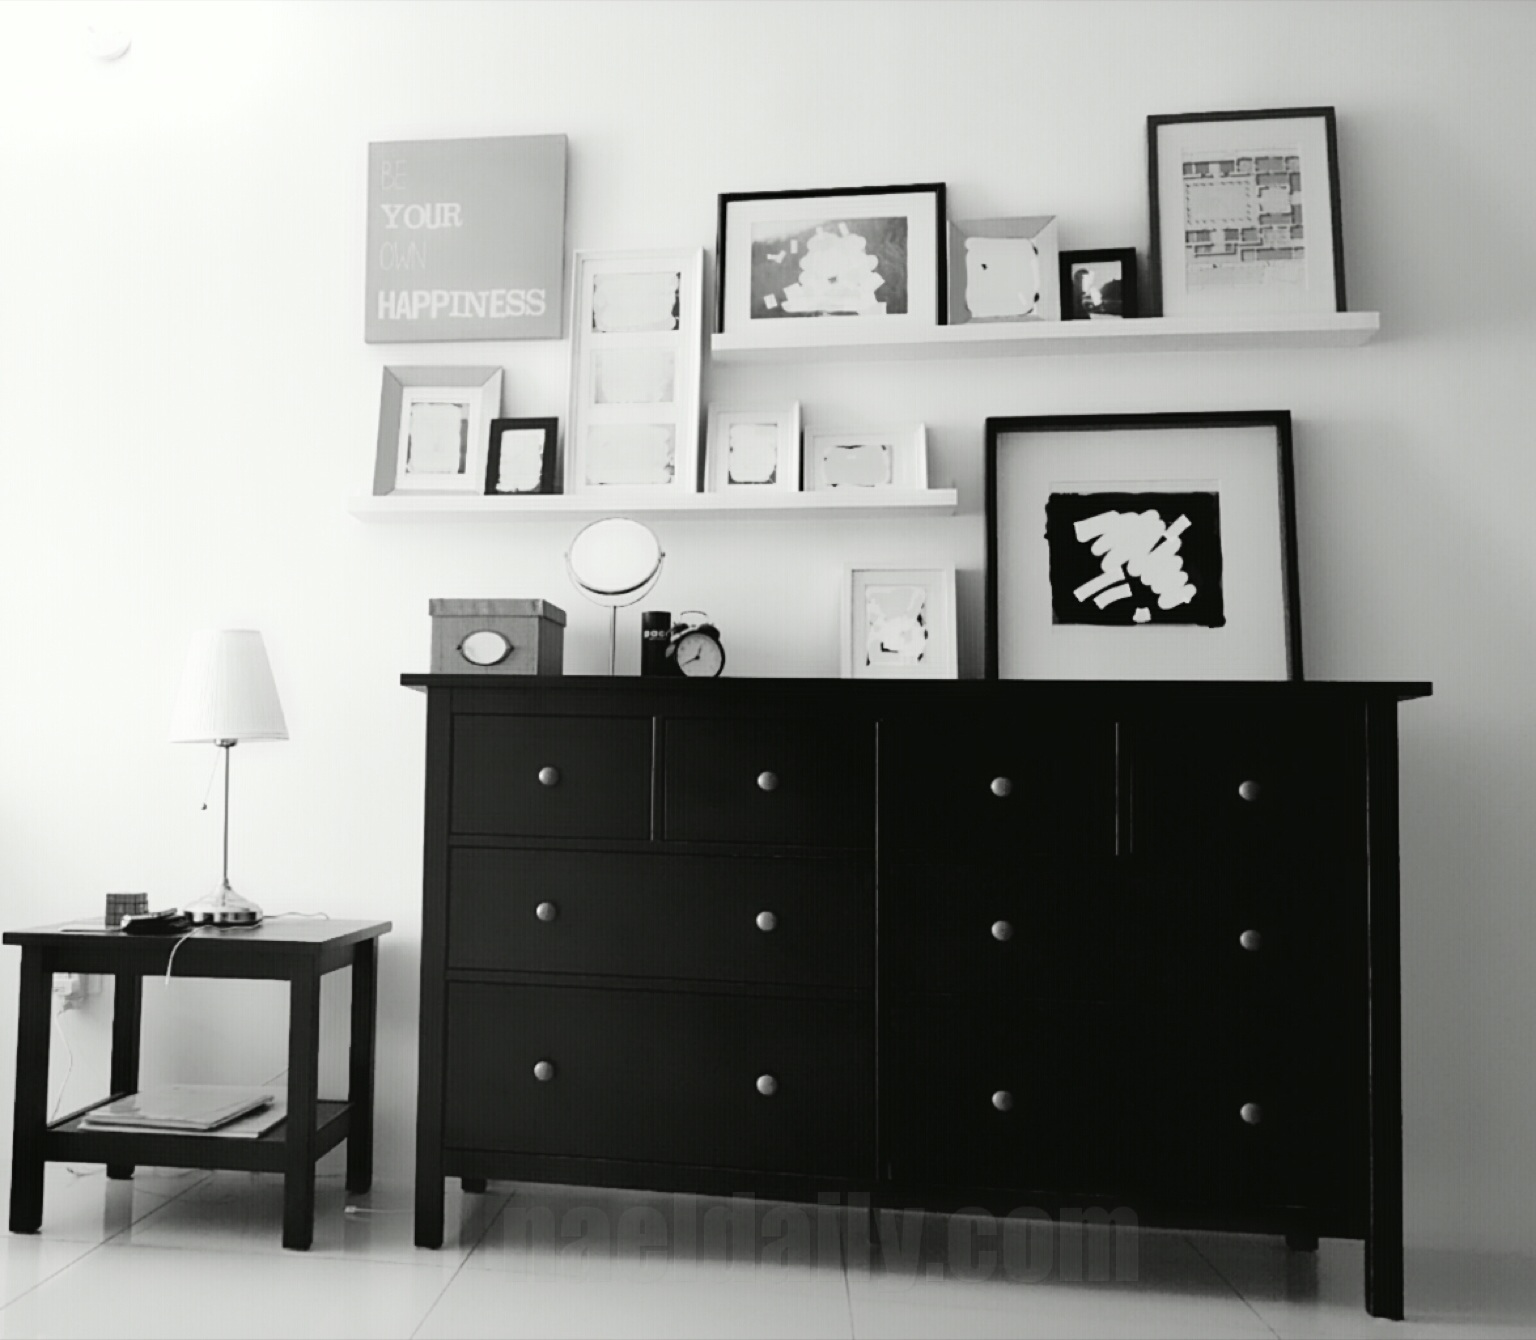 Wall Decor Of Ikea Picture Ledge